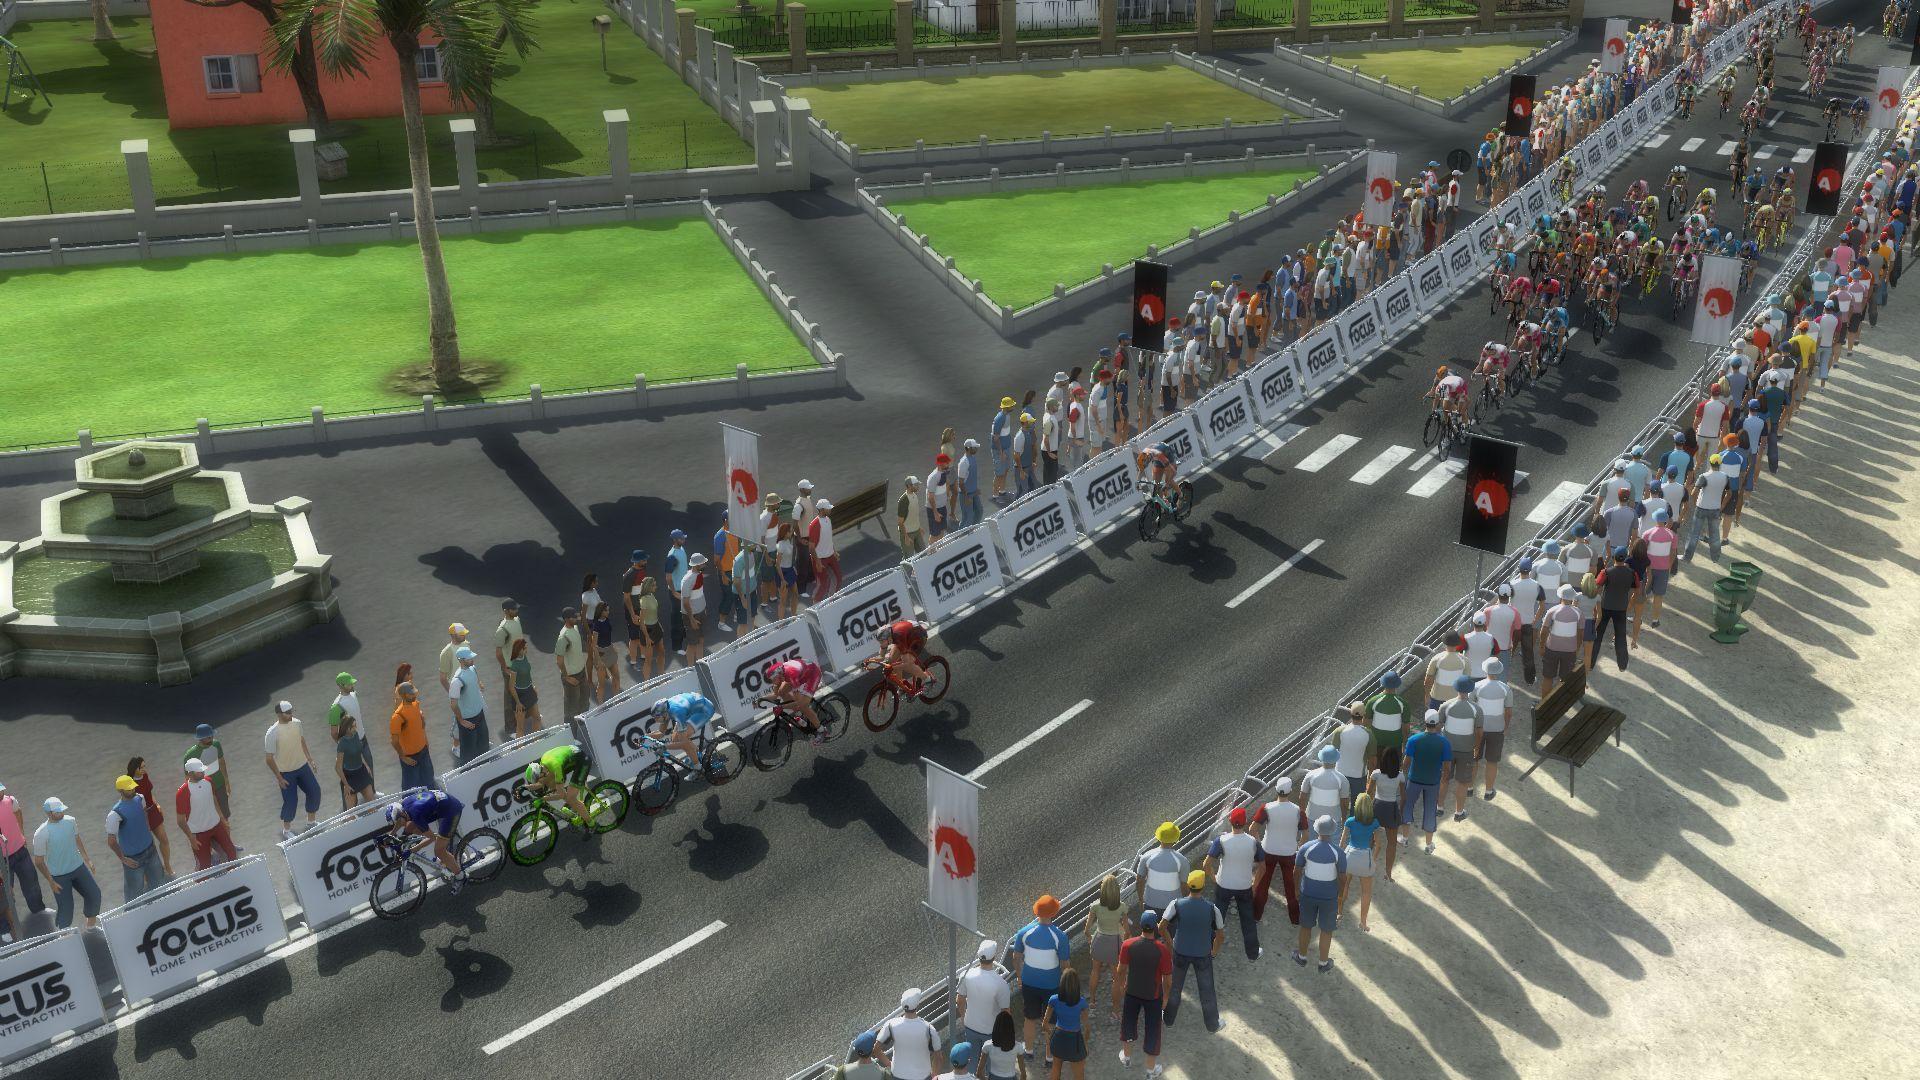 pcmdaily.com/images/mg/2019/Races/PT/Qatar/mg19_qat_s01_12.jpg